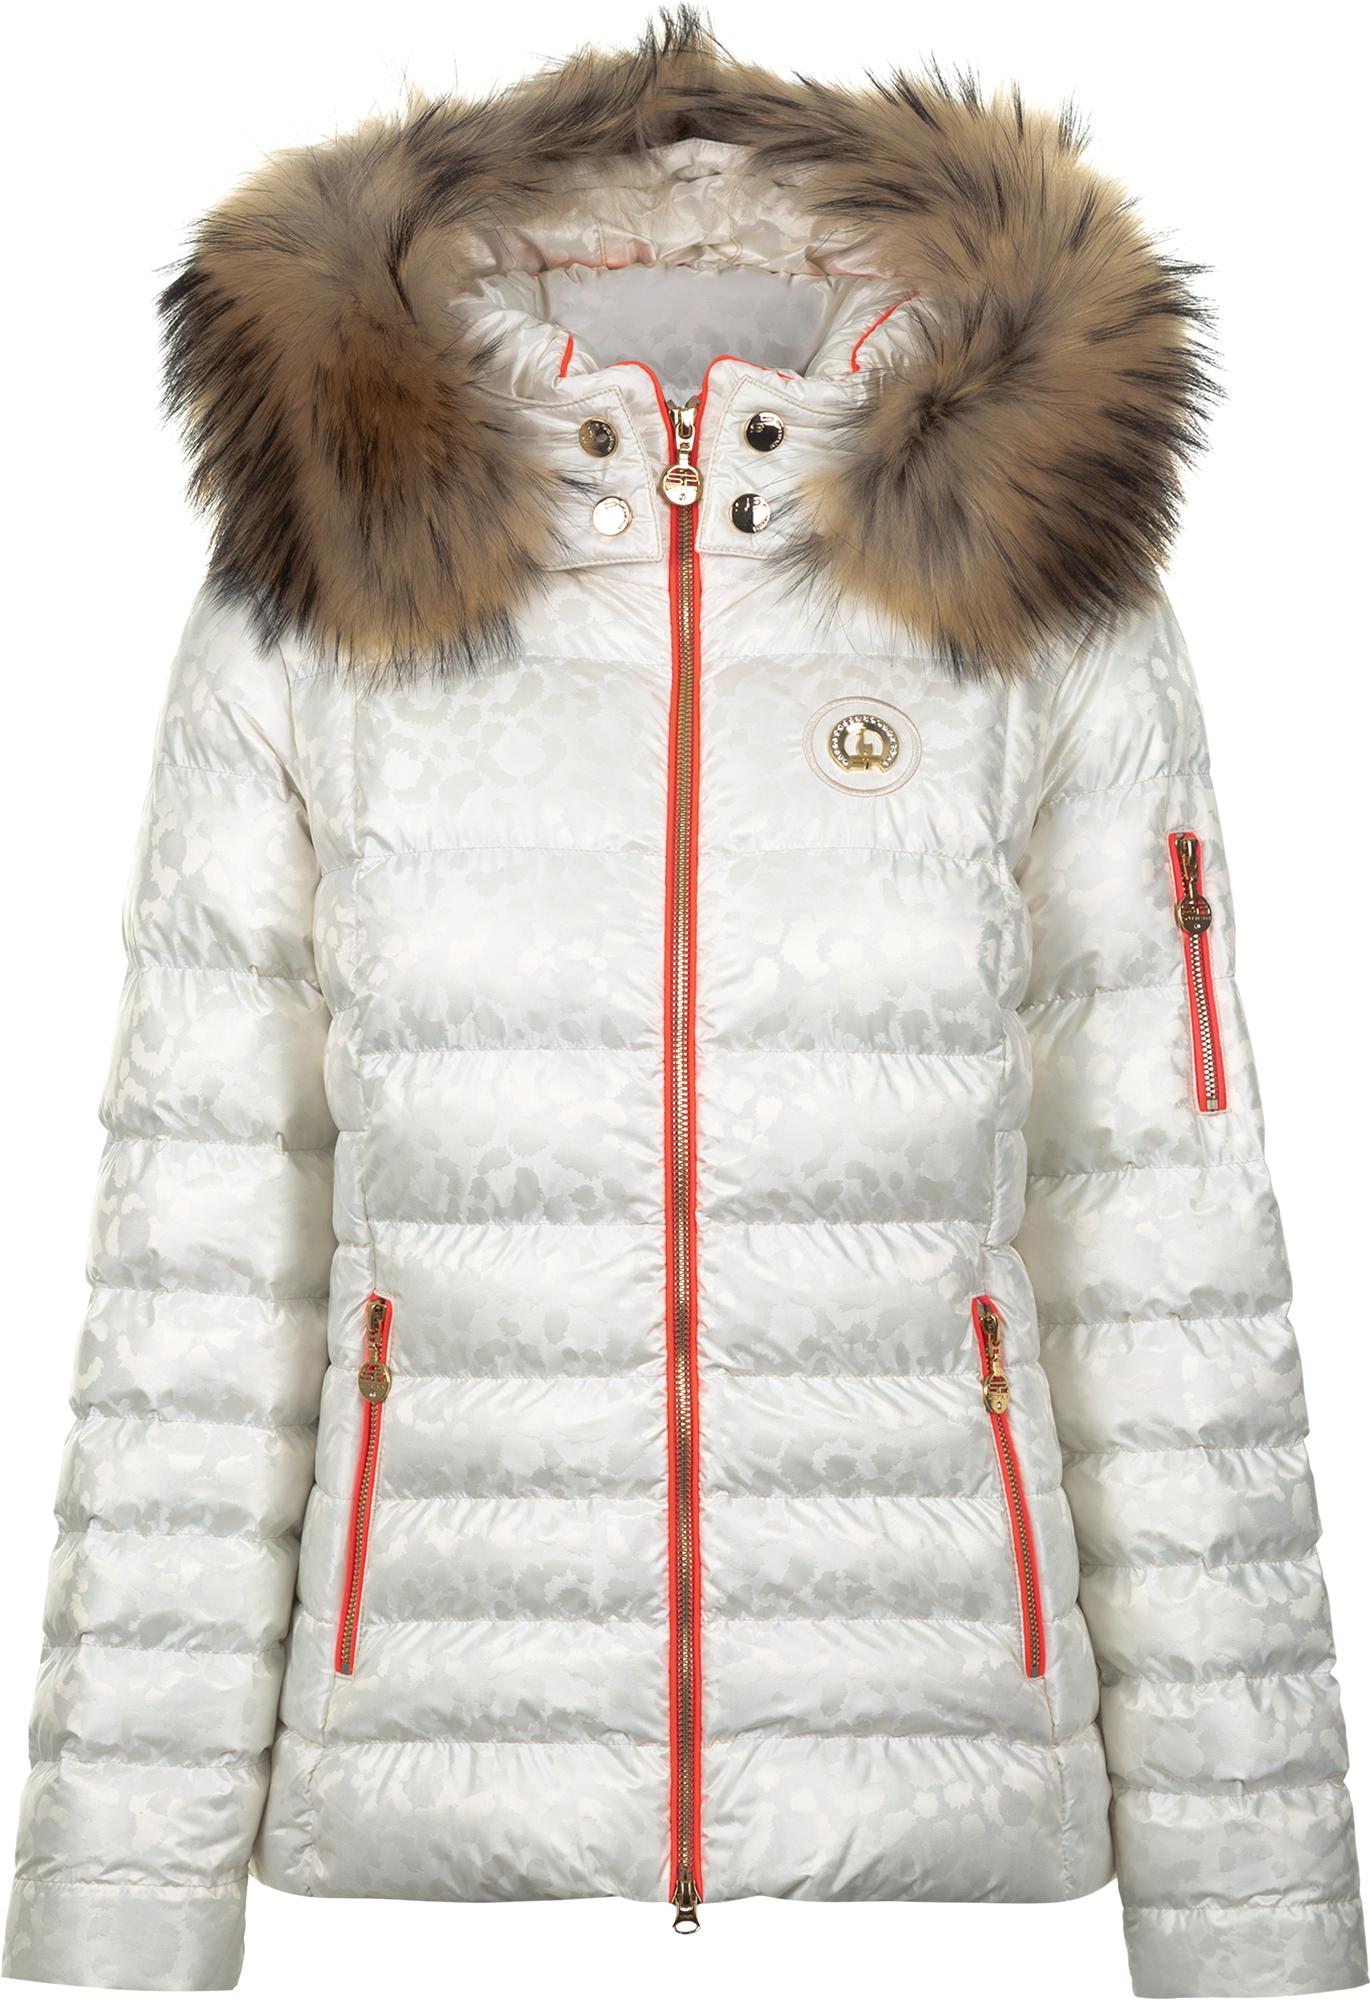 Sportalm Куртка пуховая женская Kyla RR Exclusive, размер 44